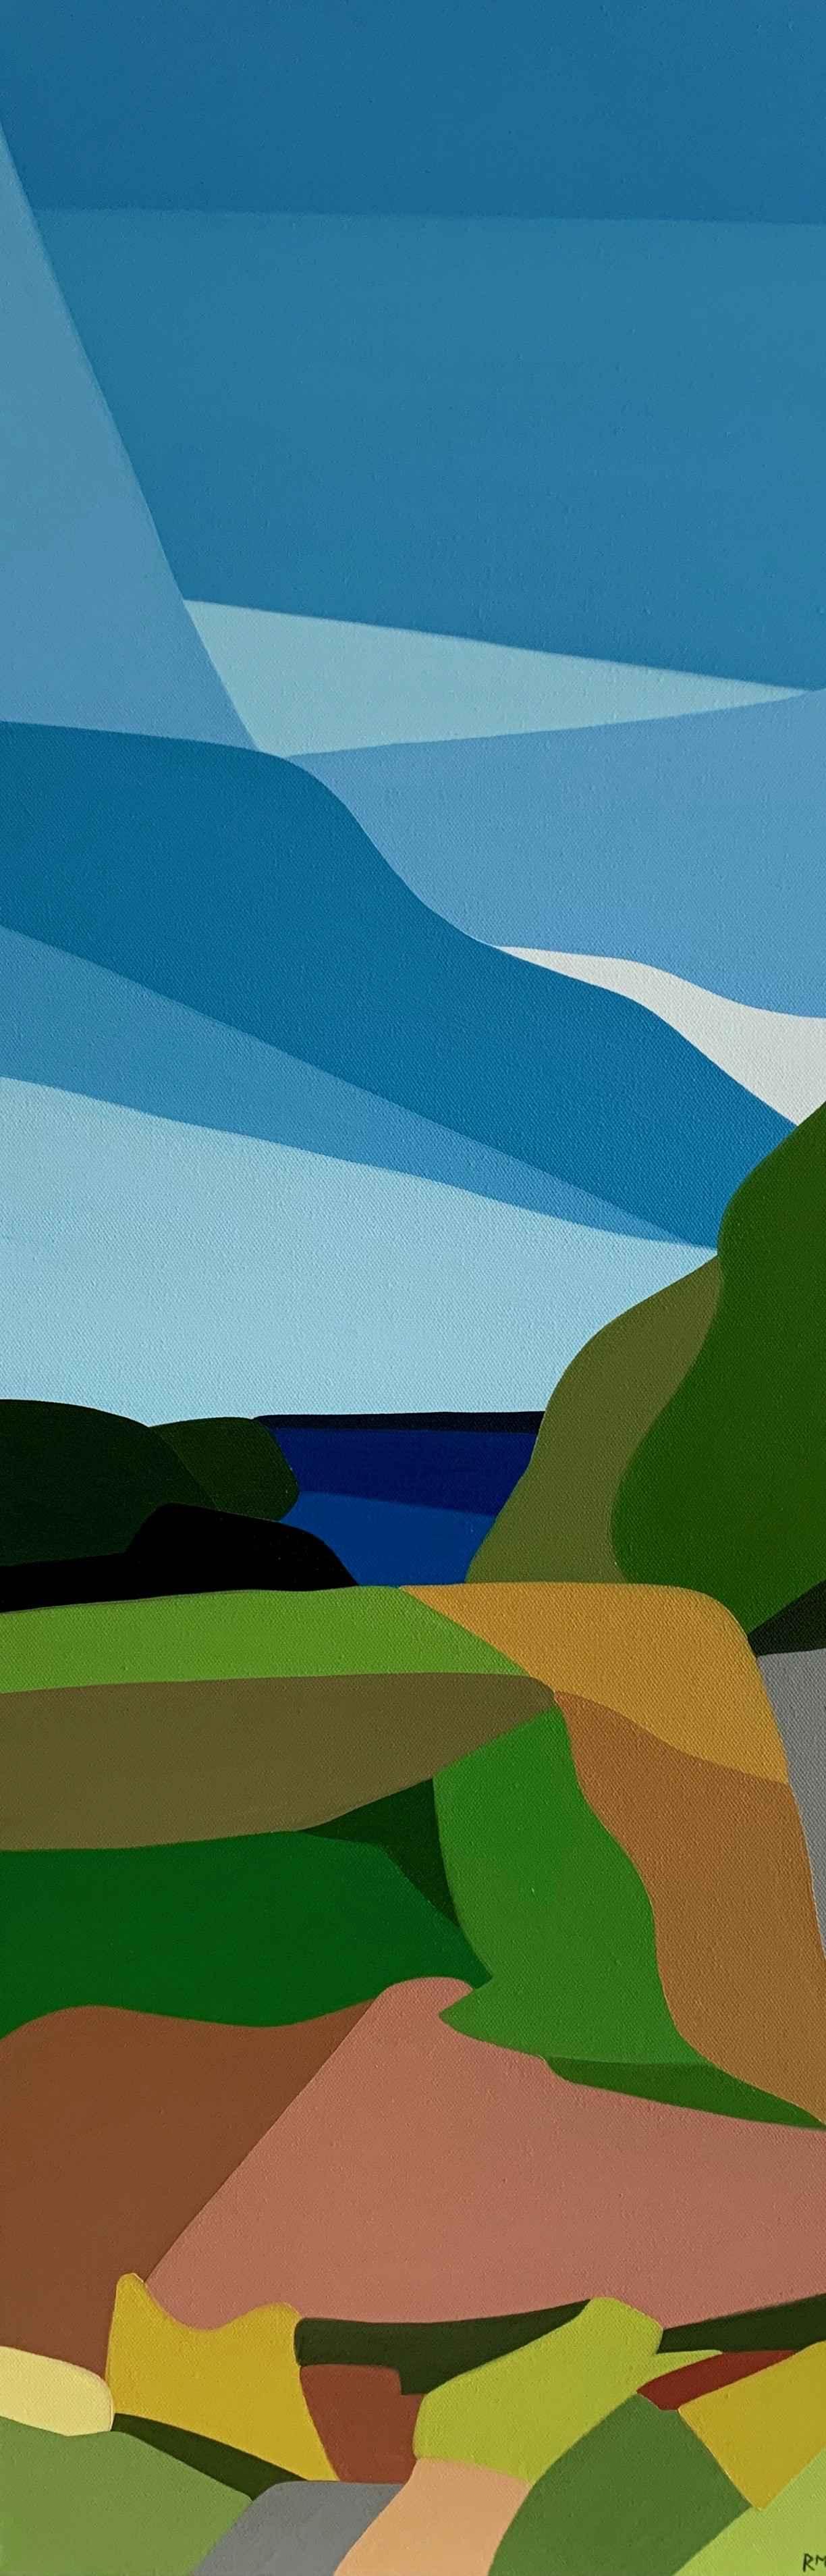 Autumn Overlook by  Rachael Cassiani - Masterpiece Online